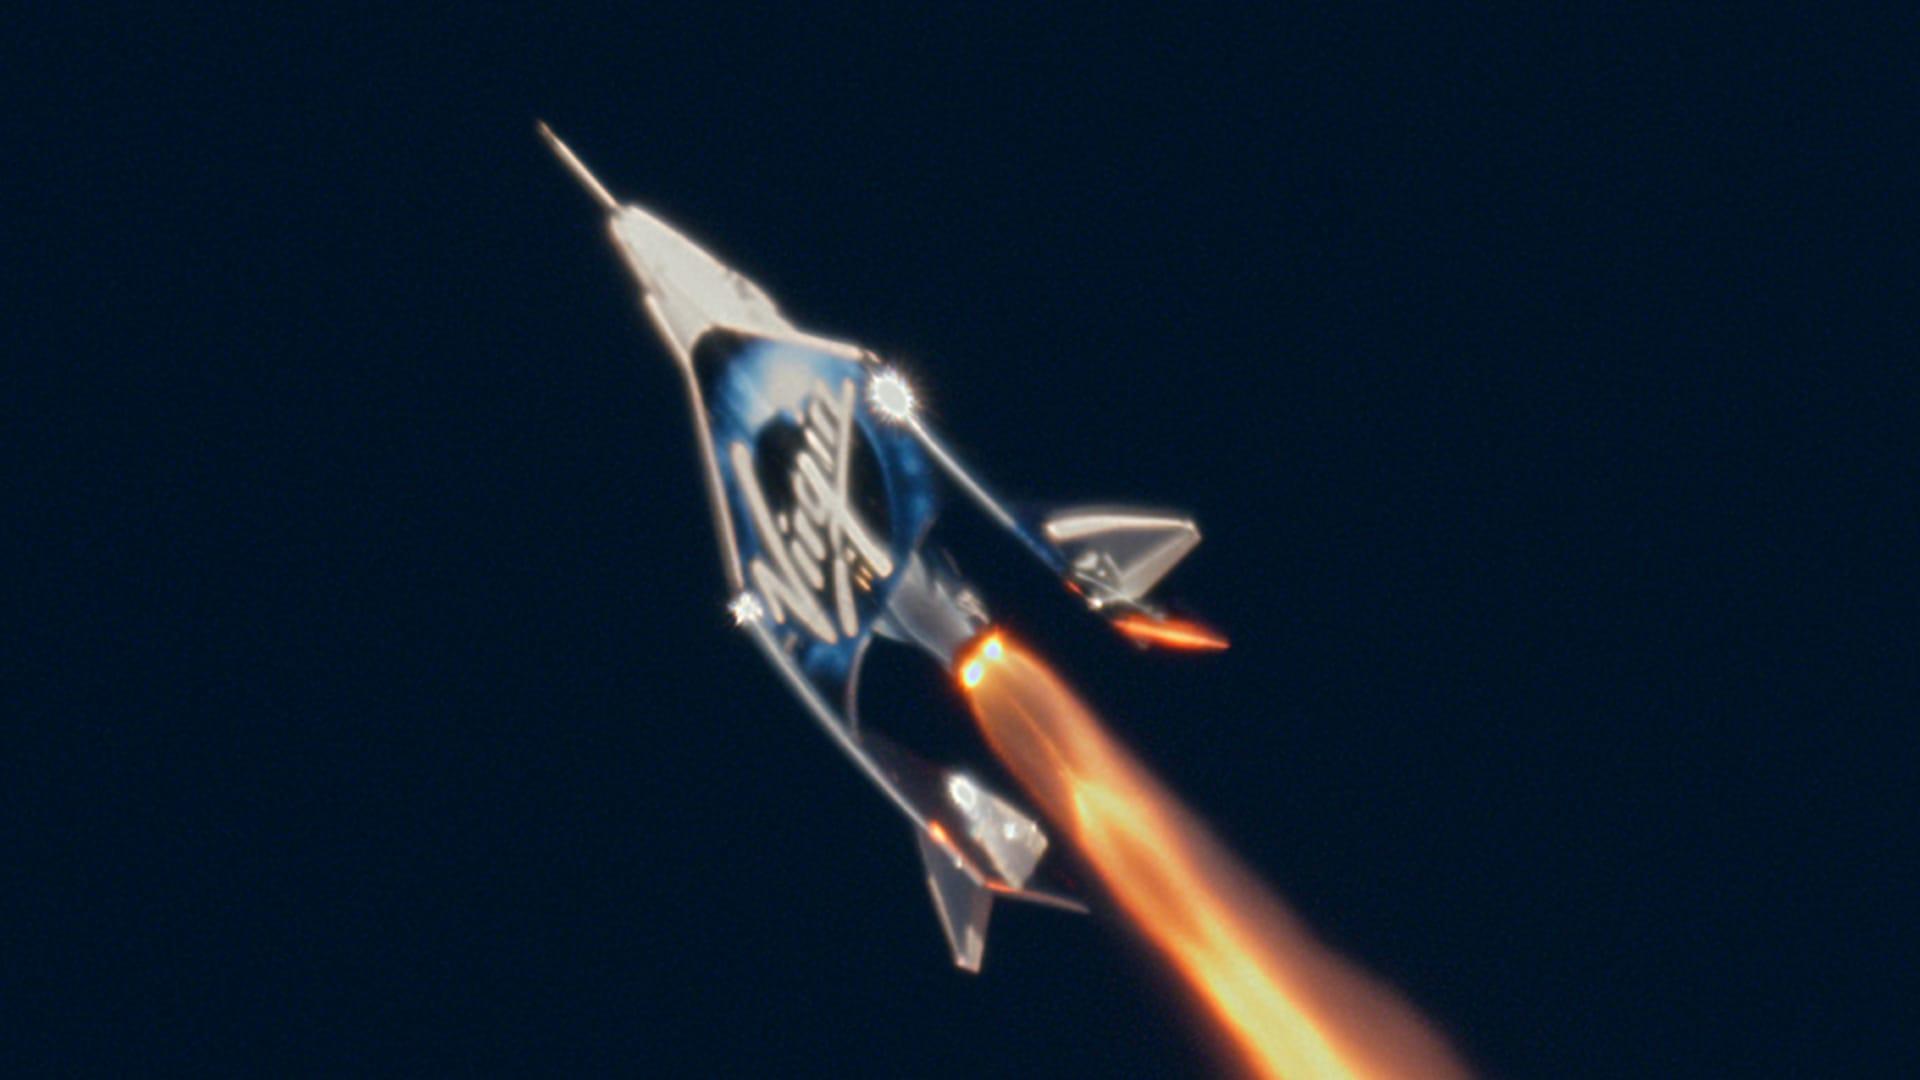 Virgin Galactic's First Spaceflight on Dec. 13, 2018